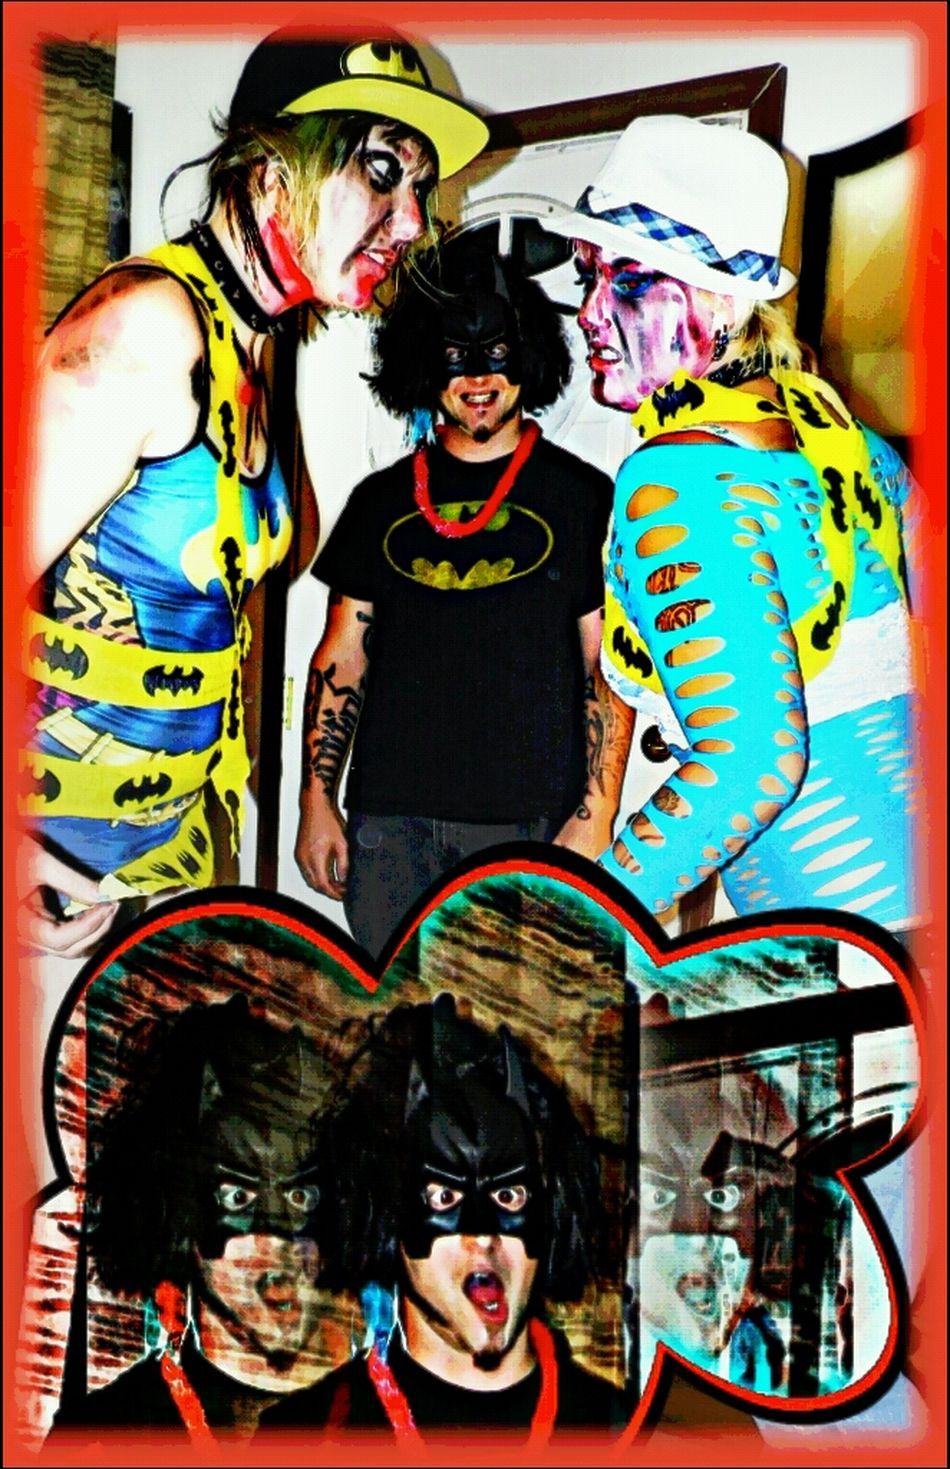 Imposters Collage Yahtzi Kissitkoolaid